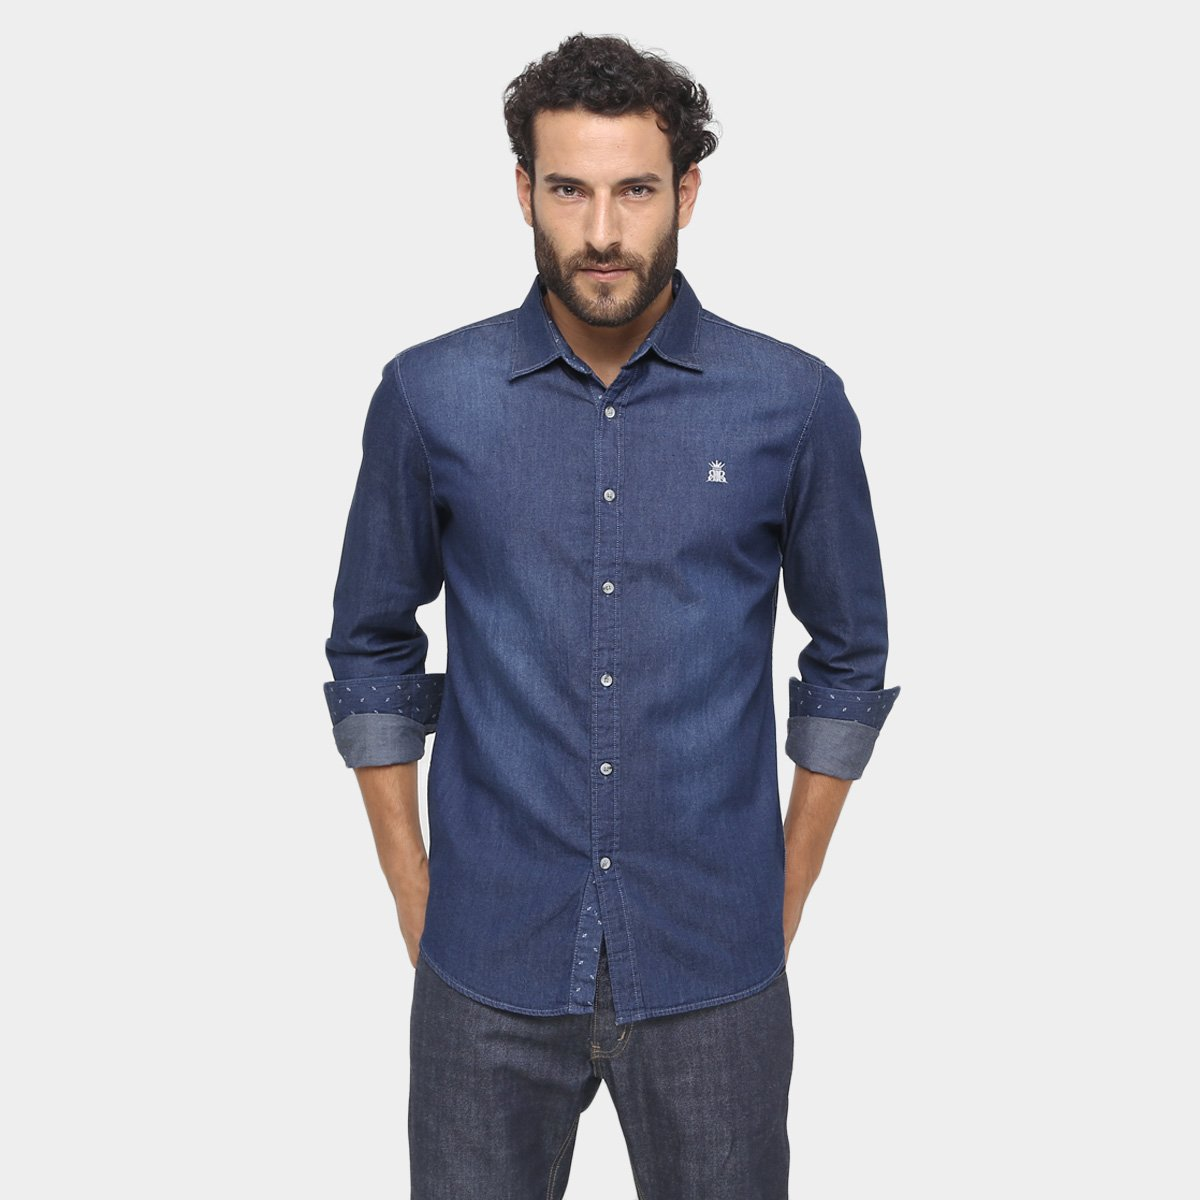 Compra luz azul camisa azul jeans oscuros online al por